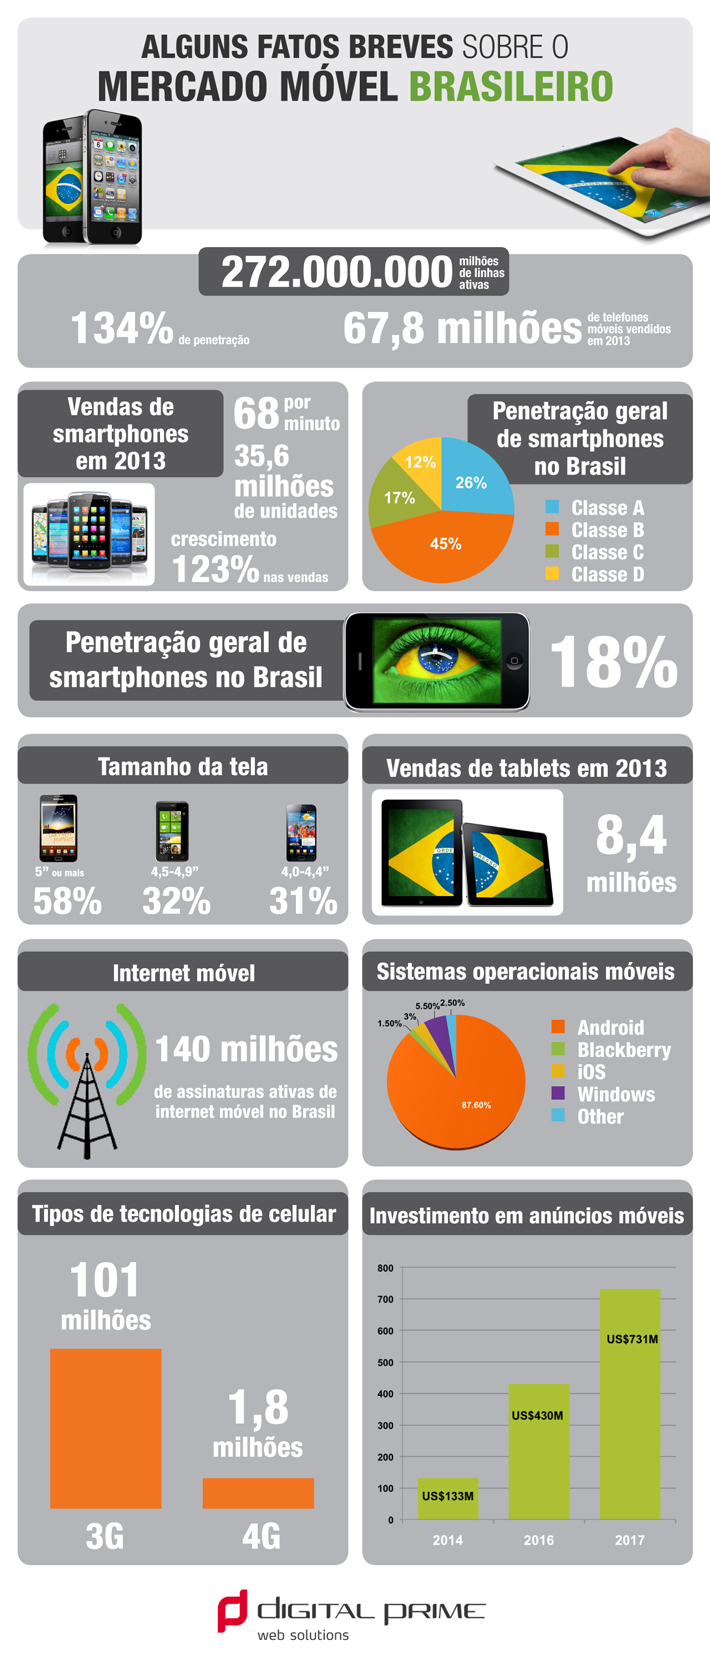 Infografico Mercado Movel Brasileiro - Digital Prime Web Solutions